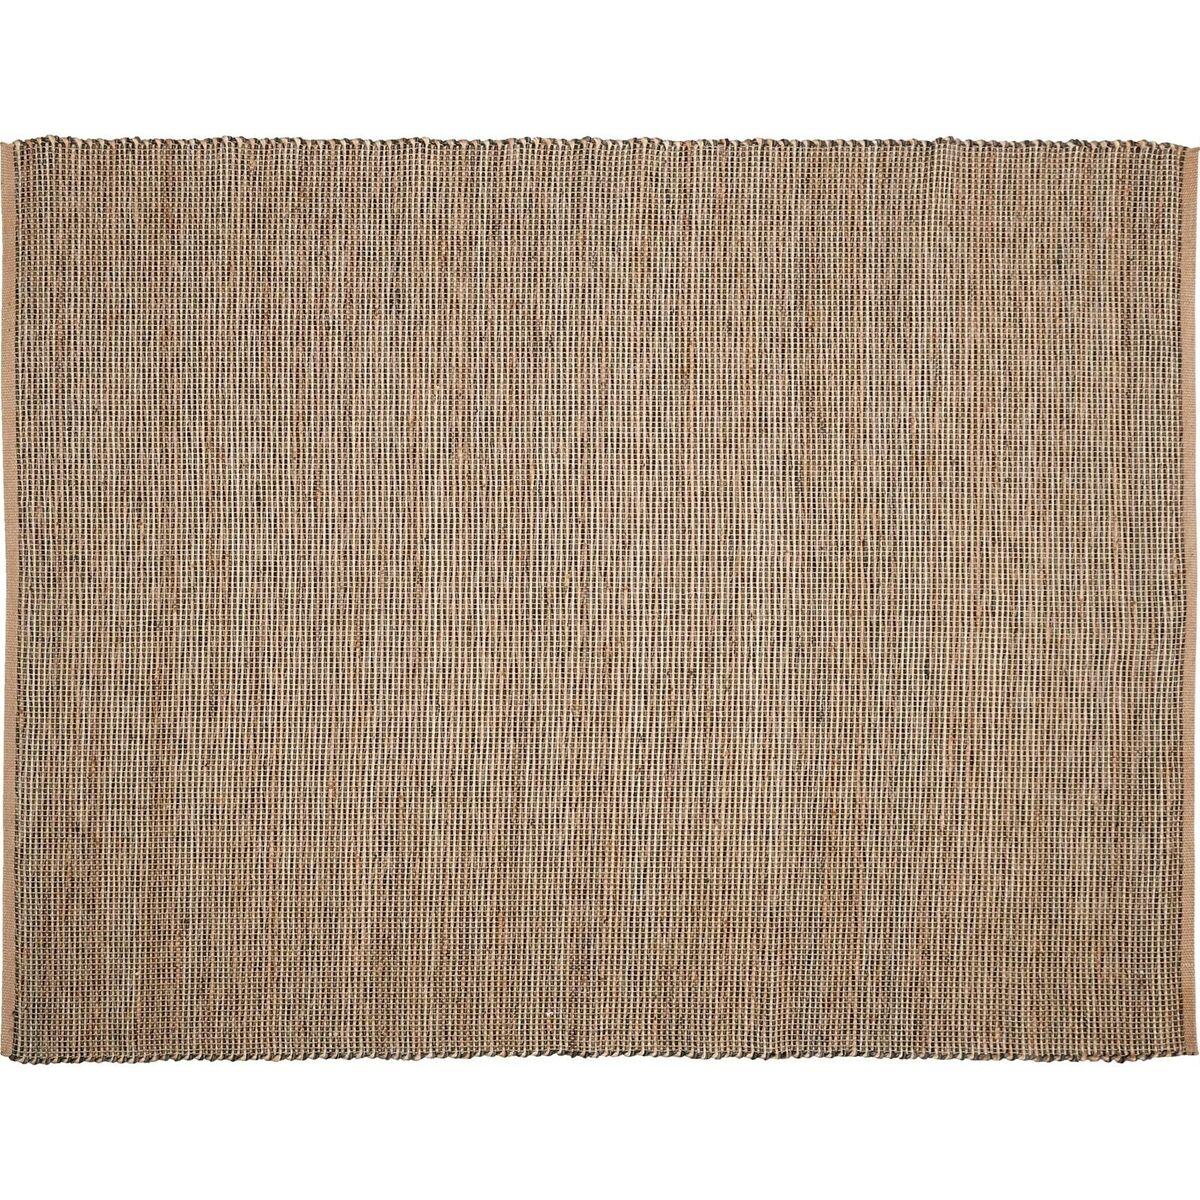 276502708 Sunita Jute tæppe 160 x 230 cm, Jute tæppe. Vask: kan ikk...